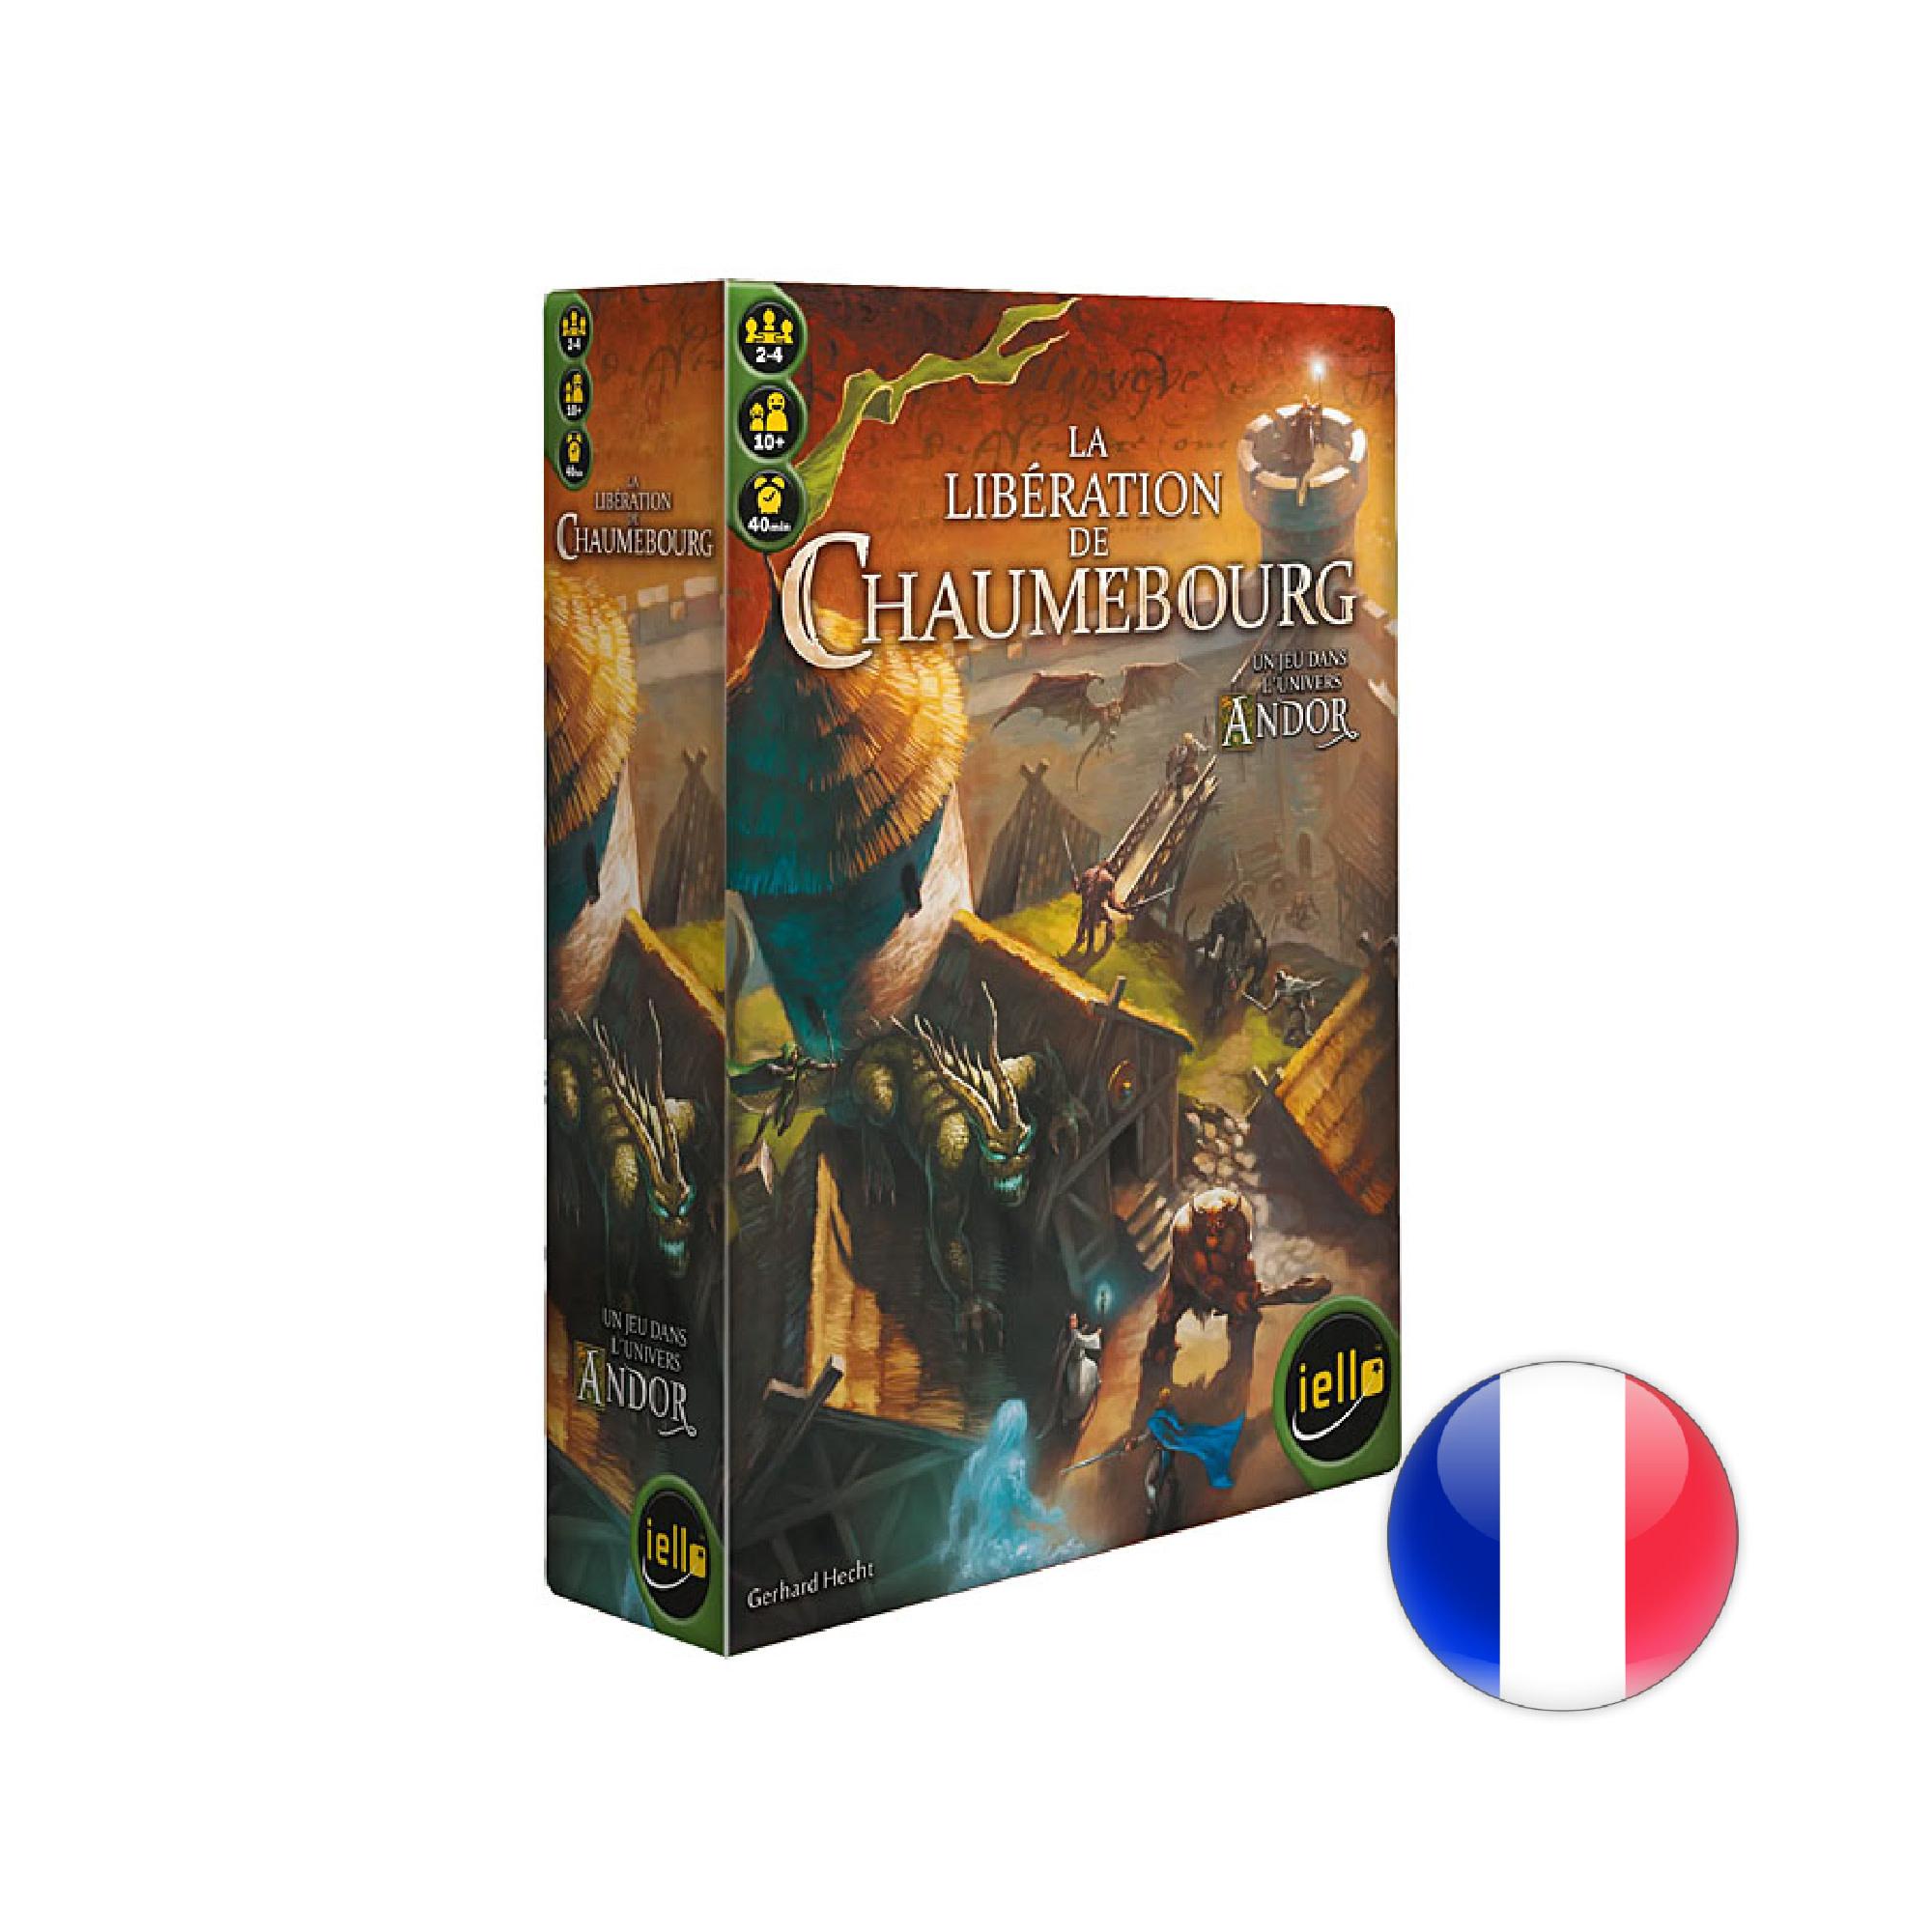 IELLO Andor - La libération de Chaumebourg